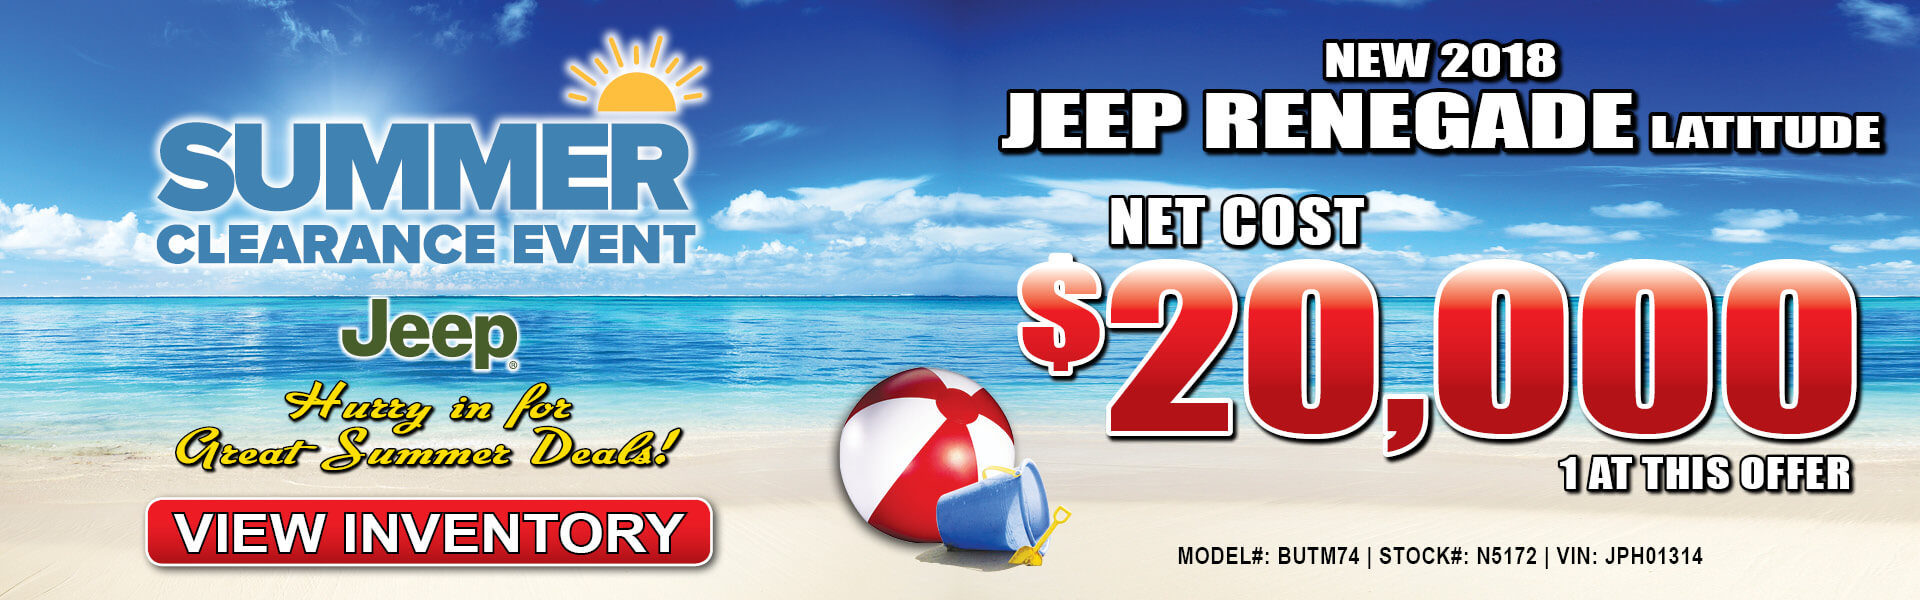 Jeep Renegade $20,000